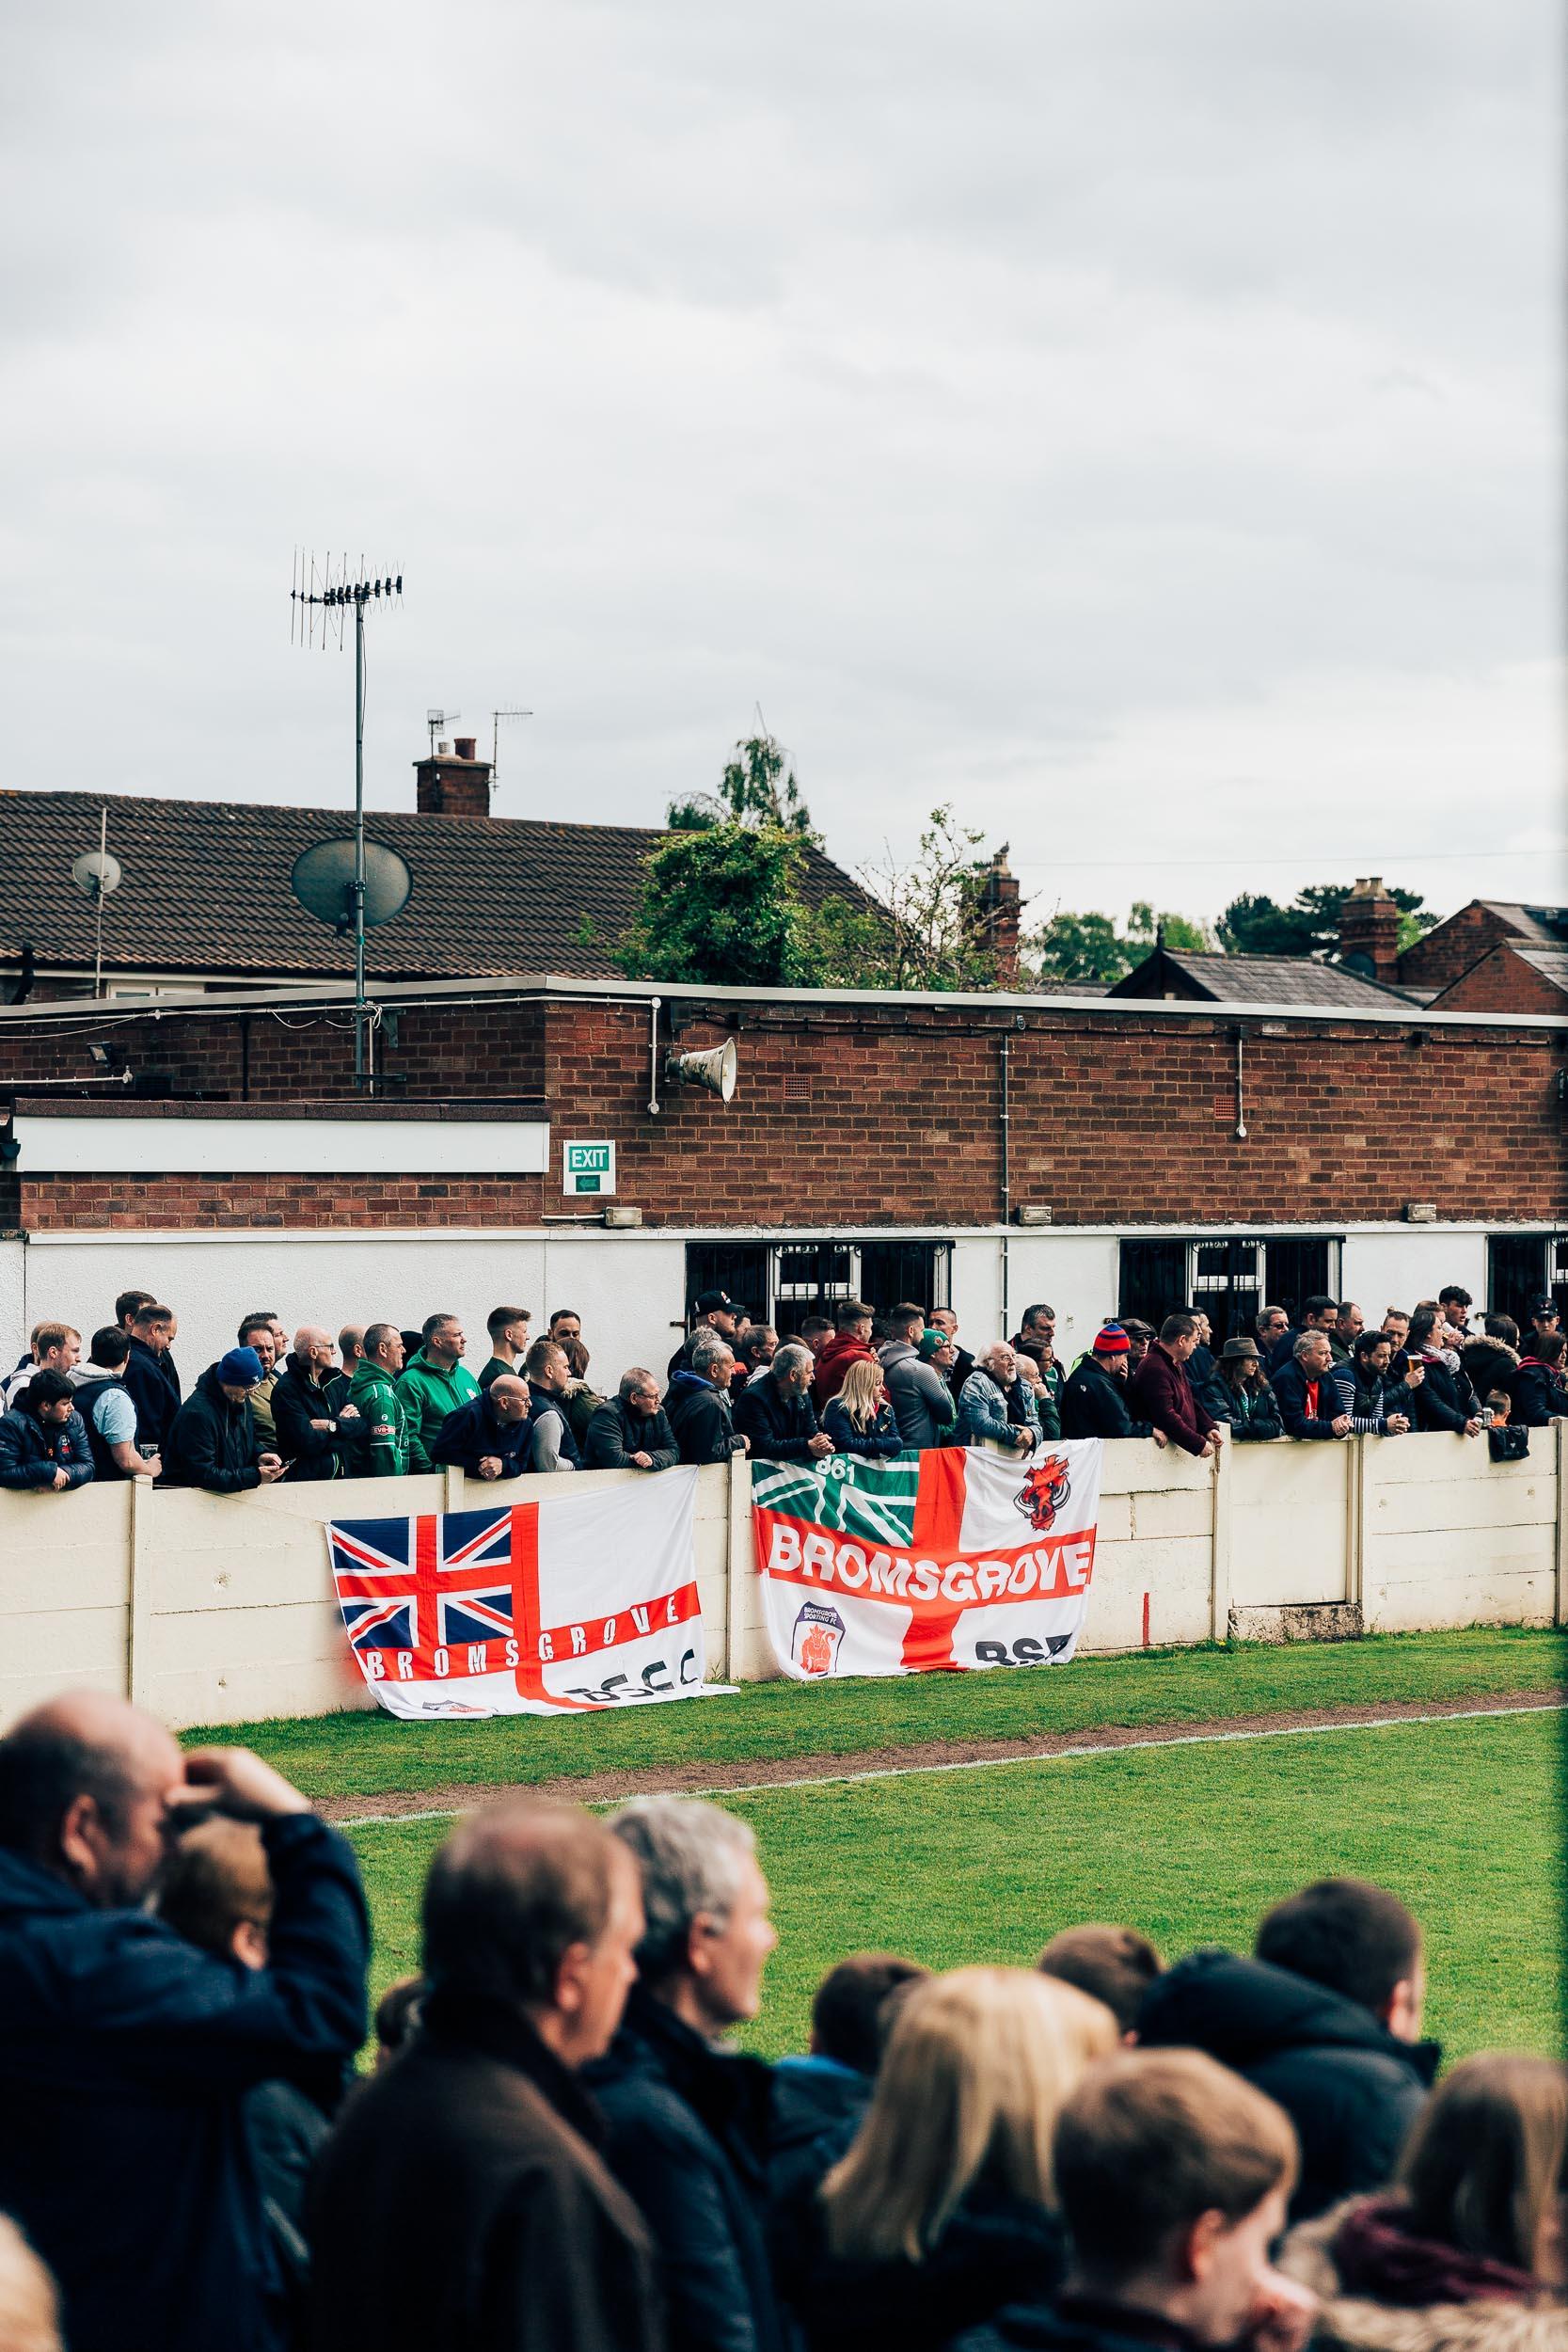 06_05_2019_Bromsgrove_Sporting_Corby-130.jpg